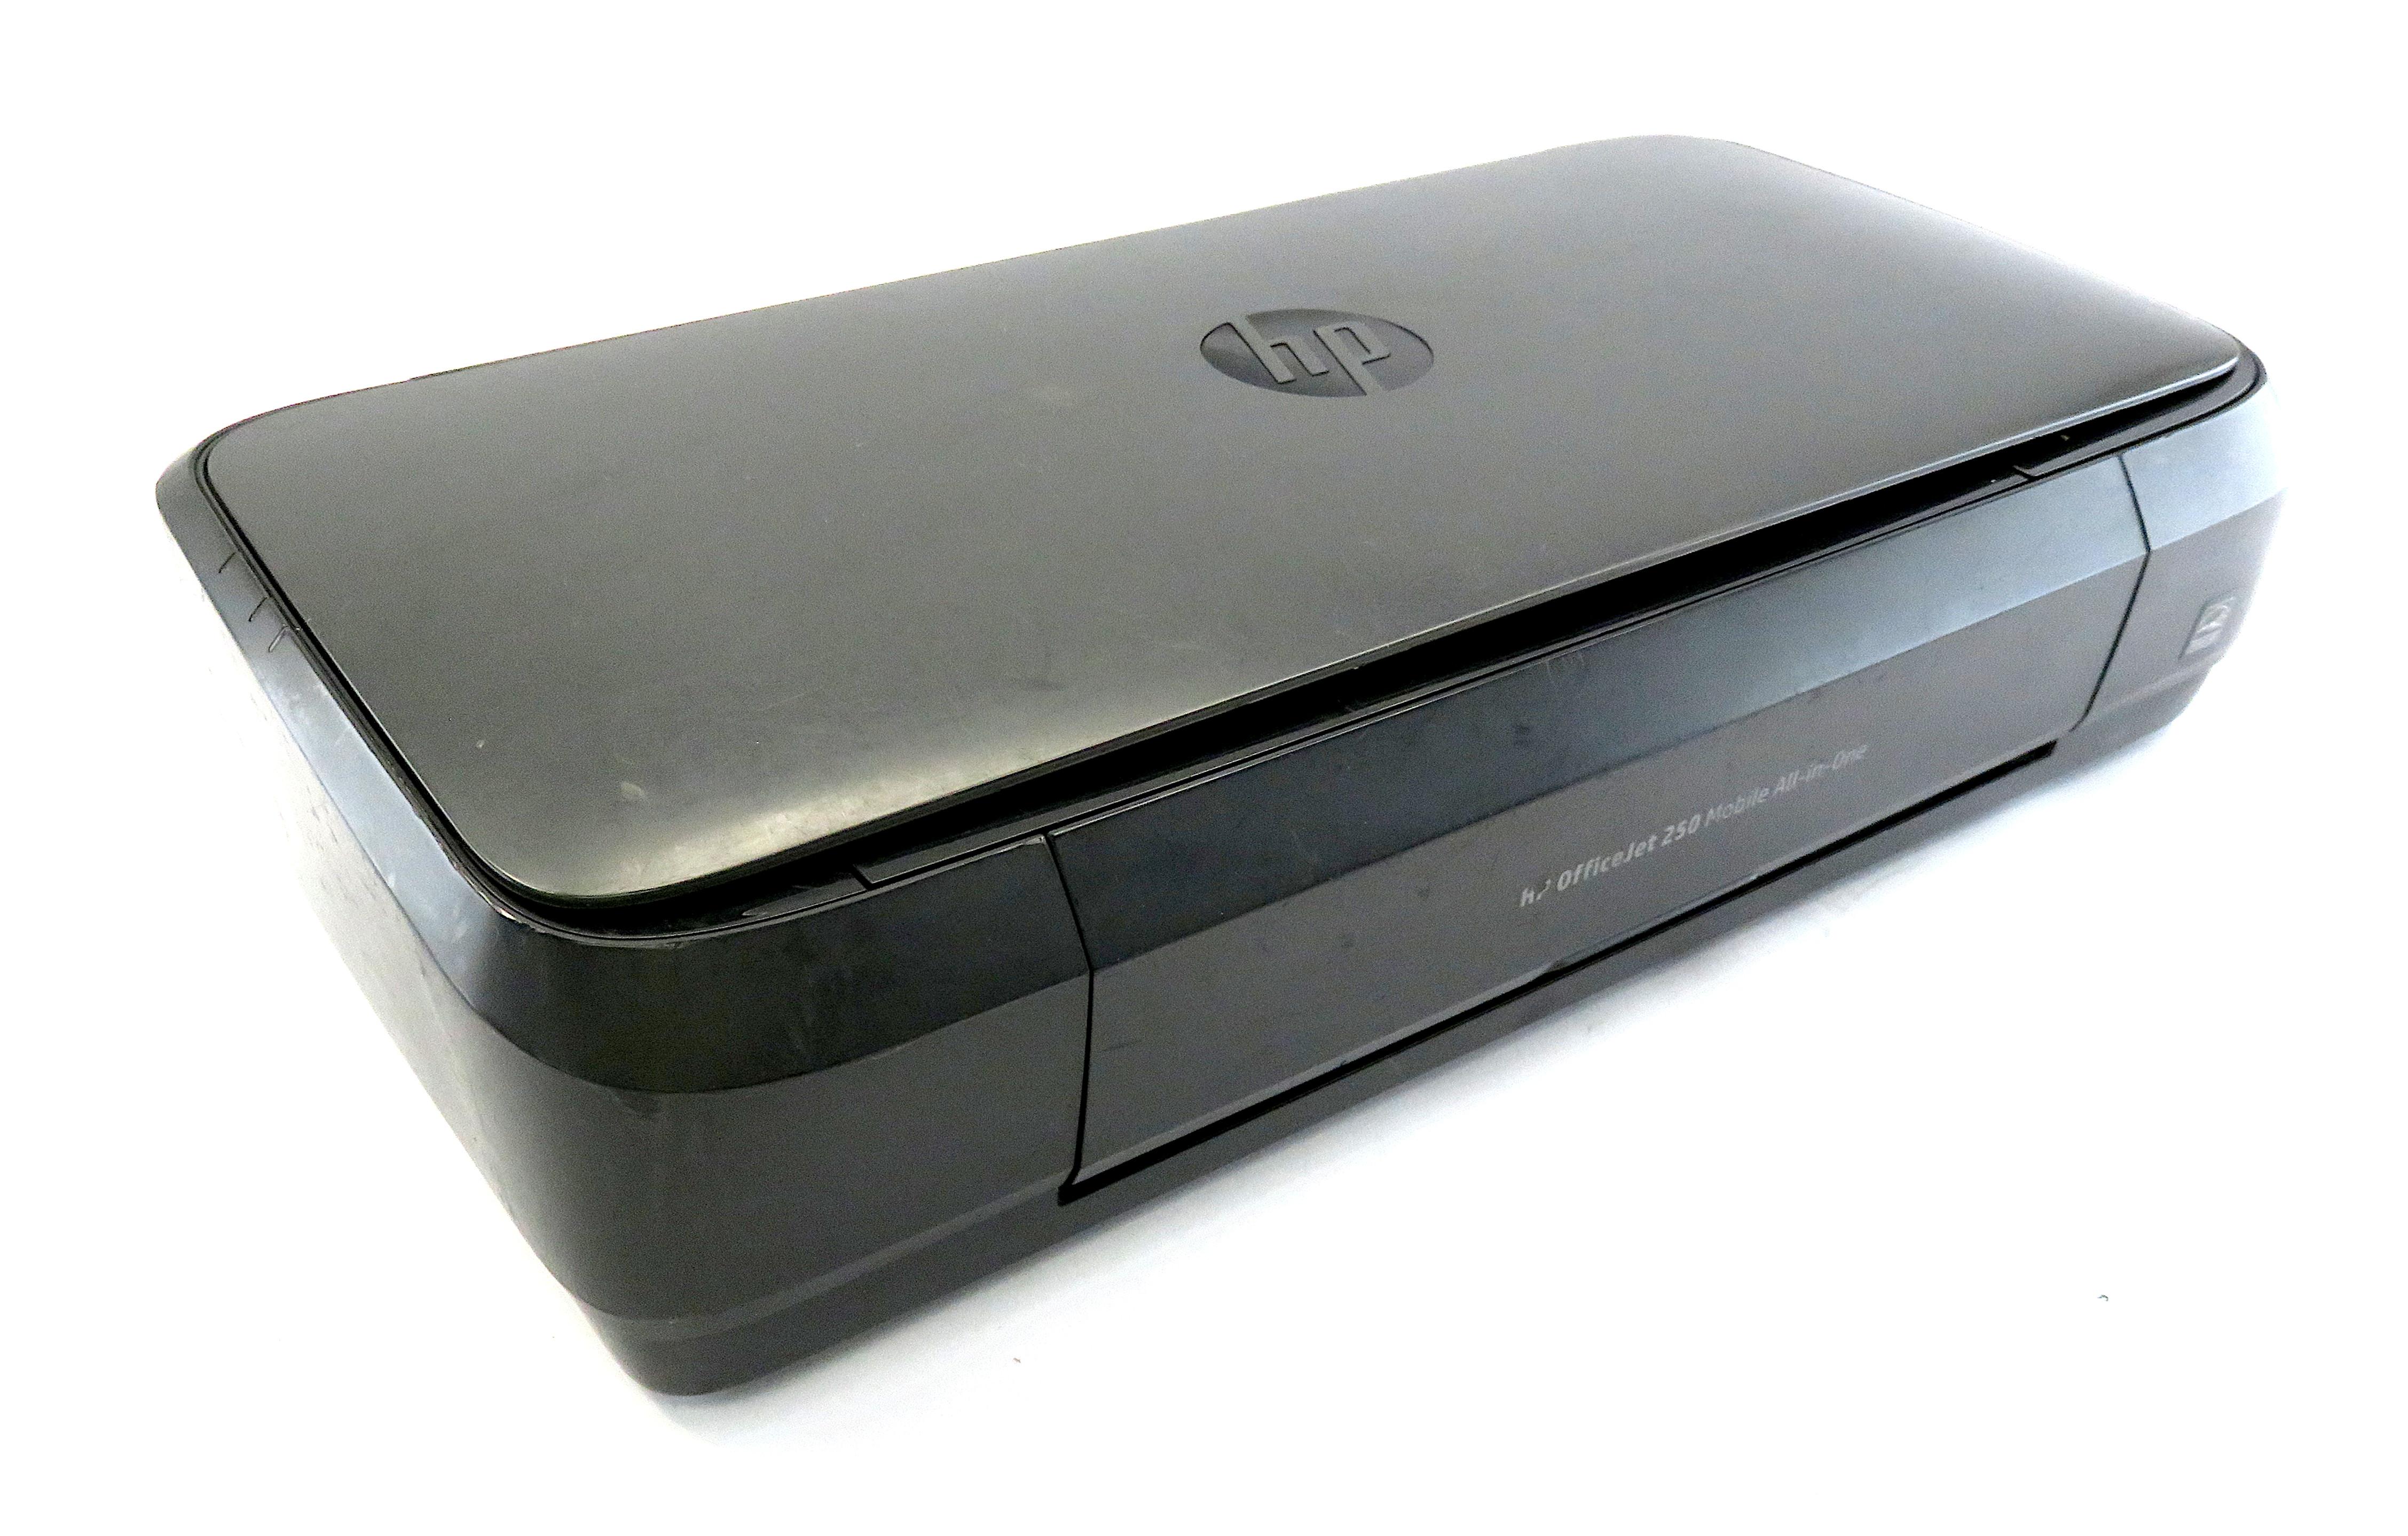 HP OfficeJet 250 Mobile All-in-One Portable Inkjet Printer - CZ992-64001